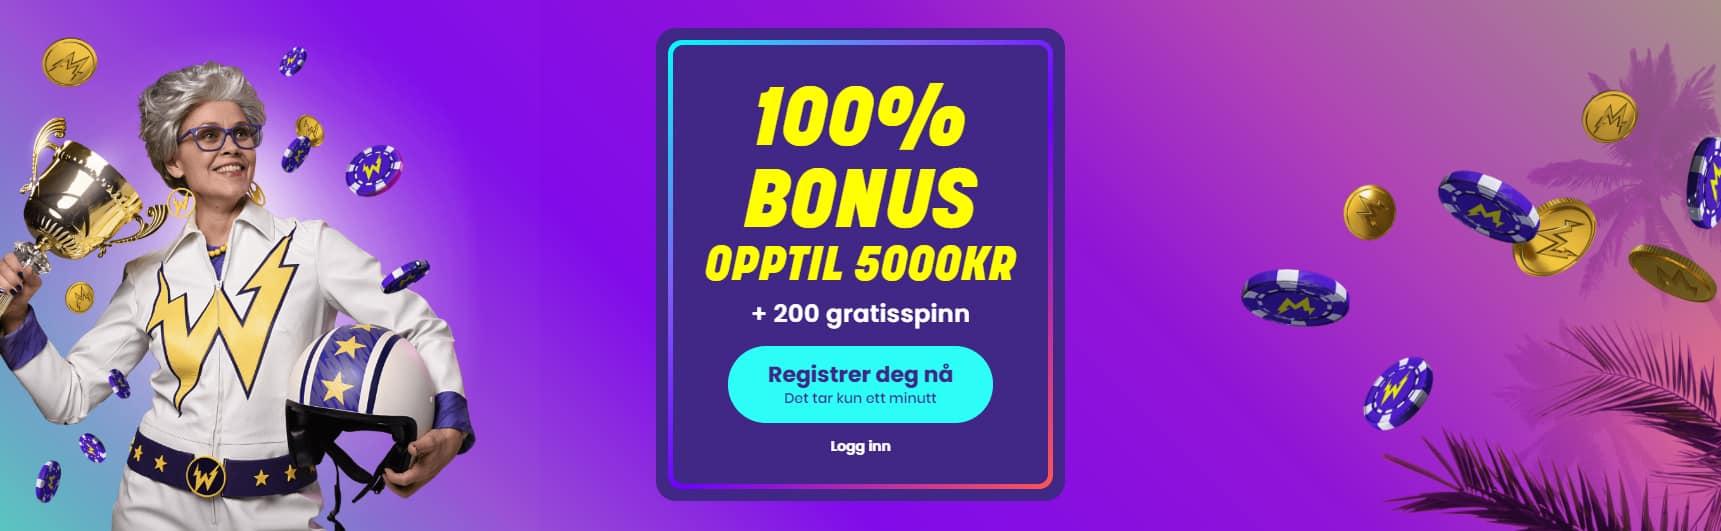 Wildz Casino Content Images 01 - Norway CasinoTopp